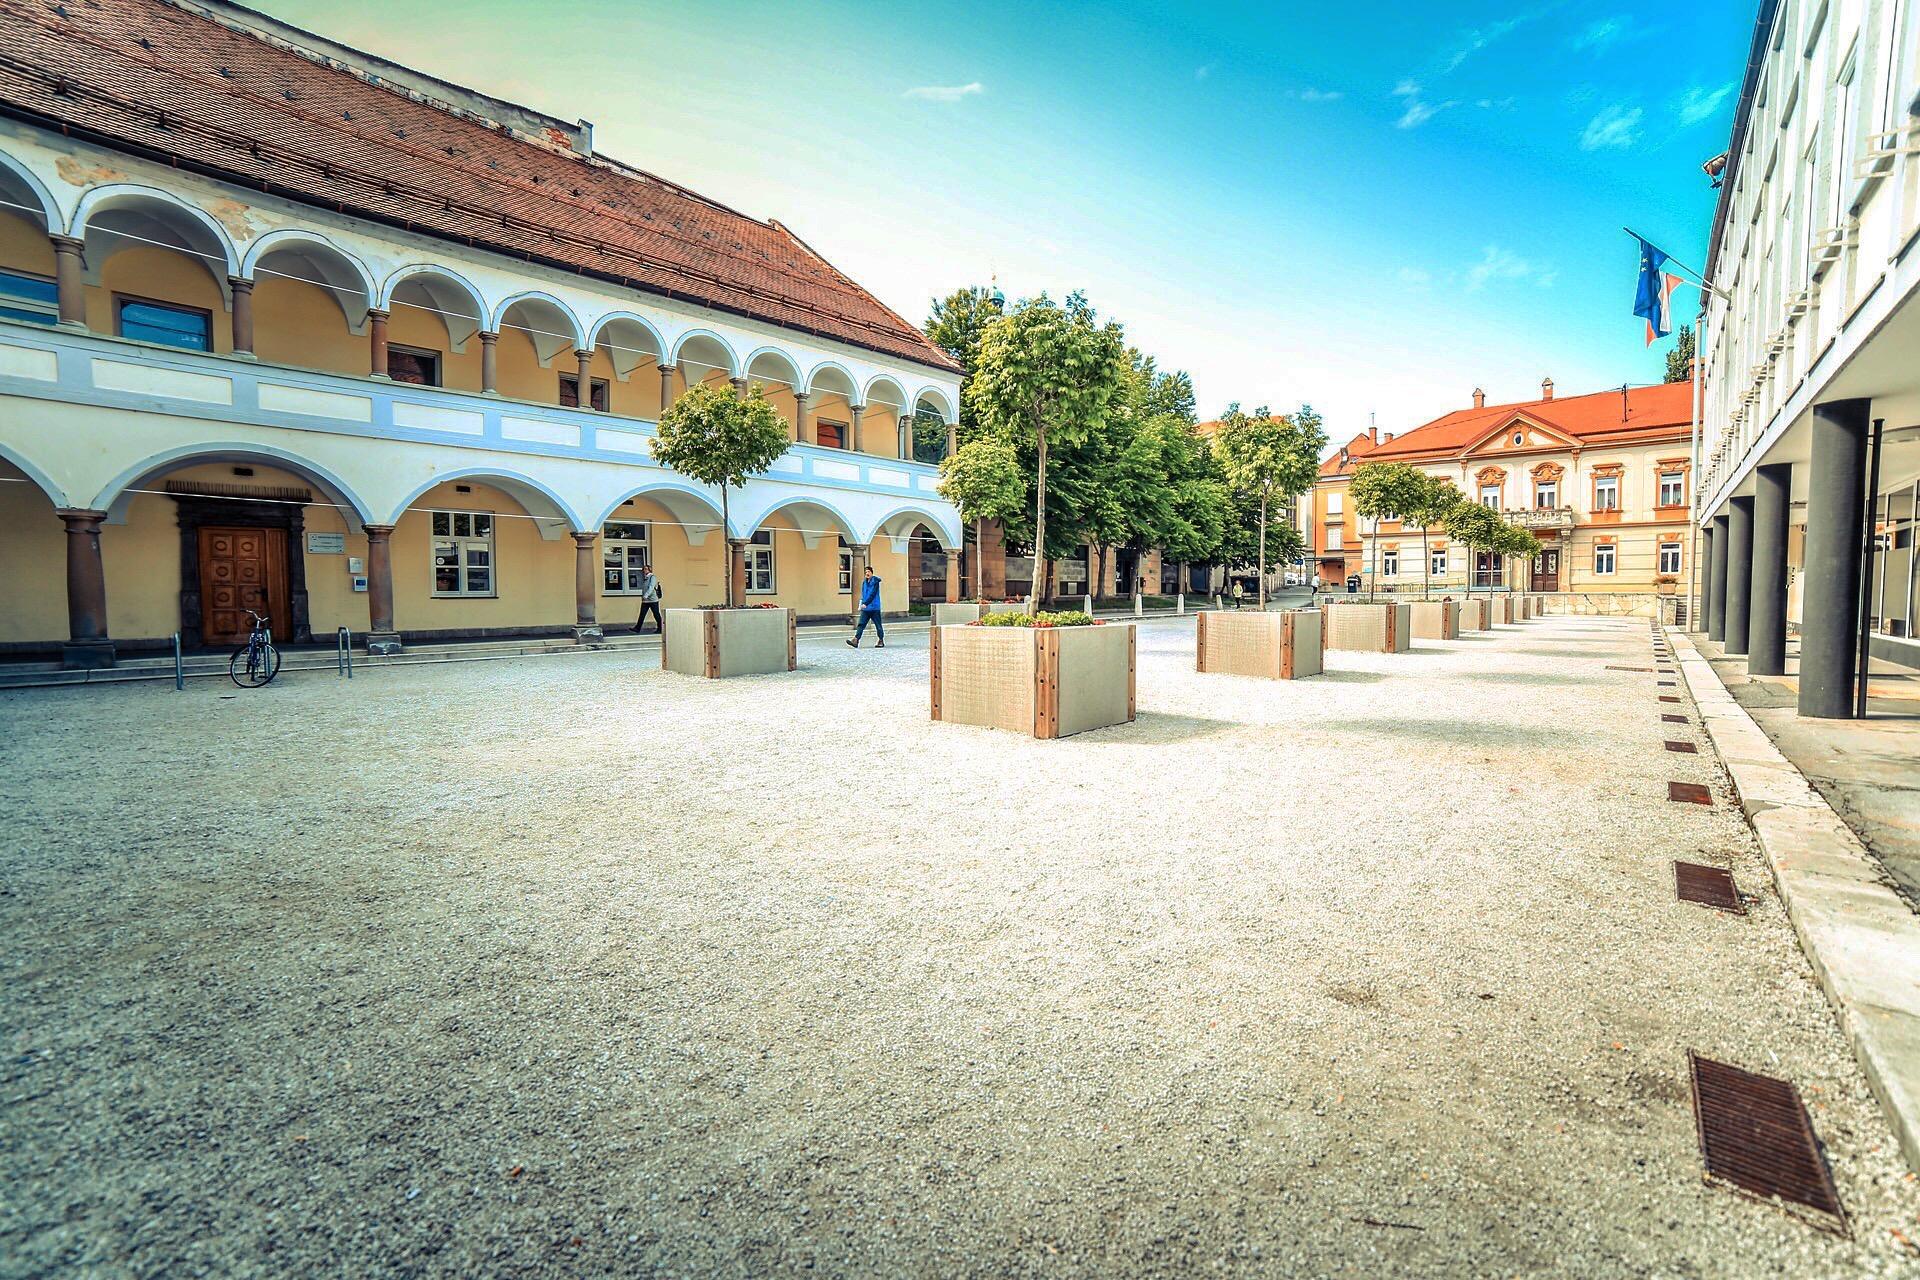 Foto: Igor Unuk - Rotovž Square